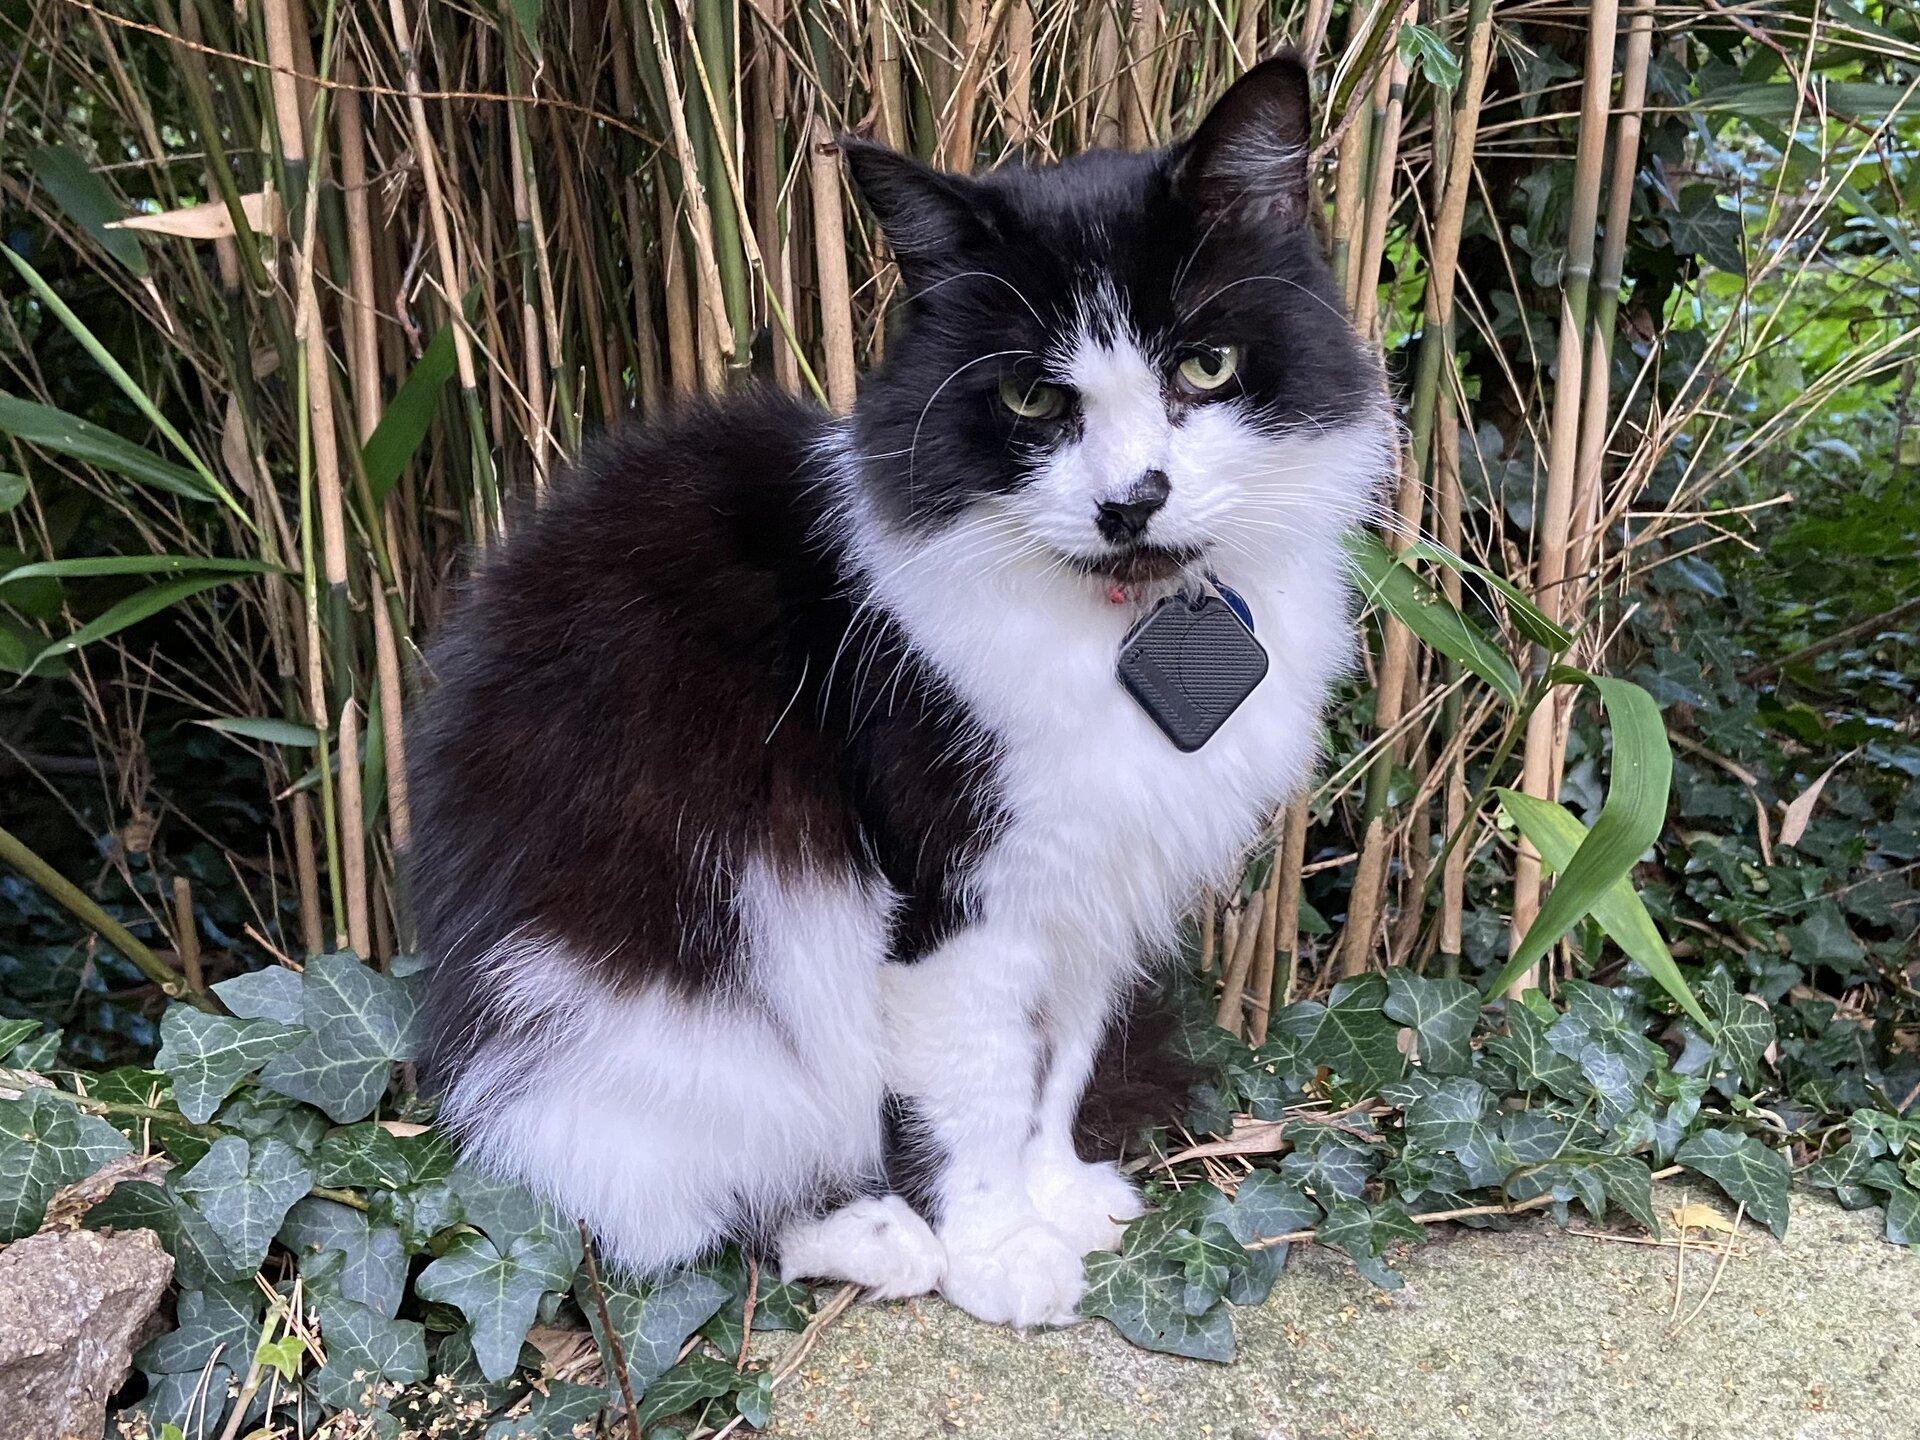 Felis silvestris (domestic cat) 'Mr Mittens' – Durham Home — Wed 07 Oct 2020 17-49-12 BST — 2983341861